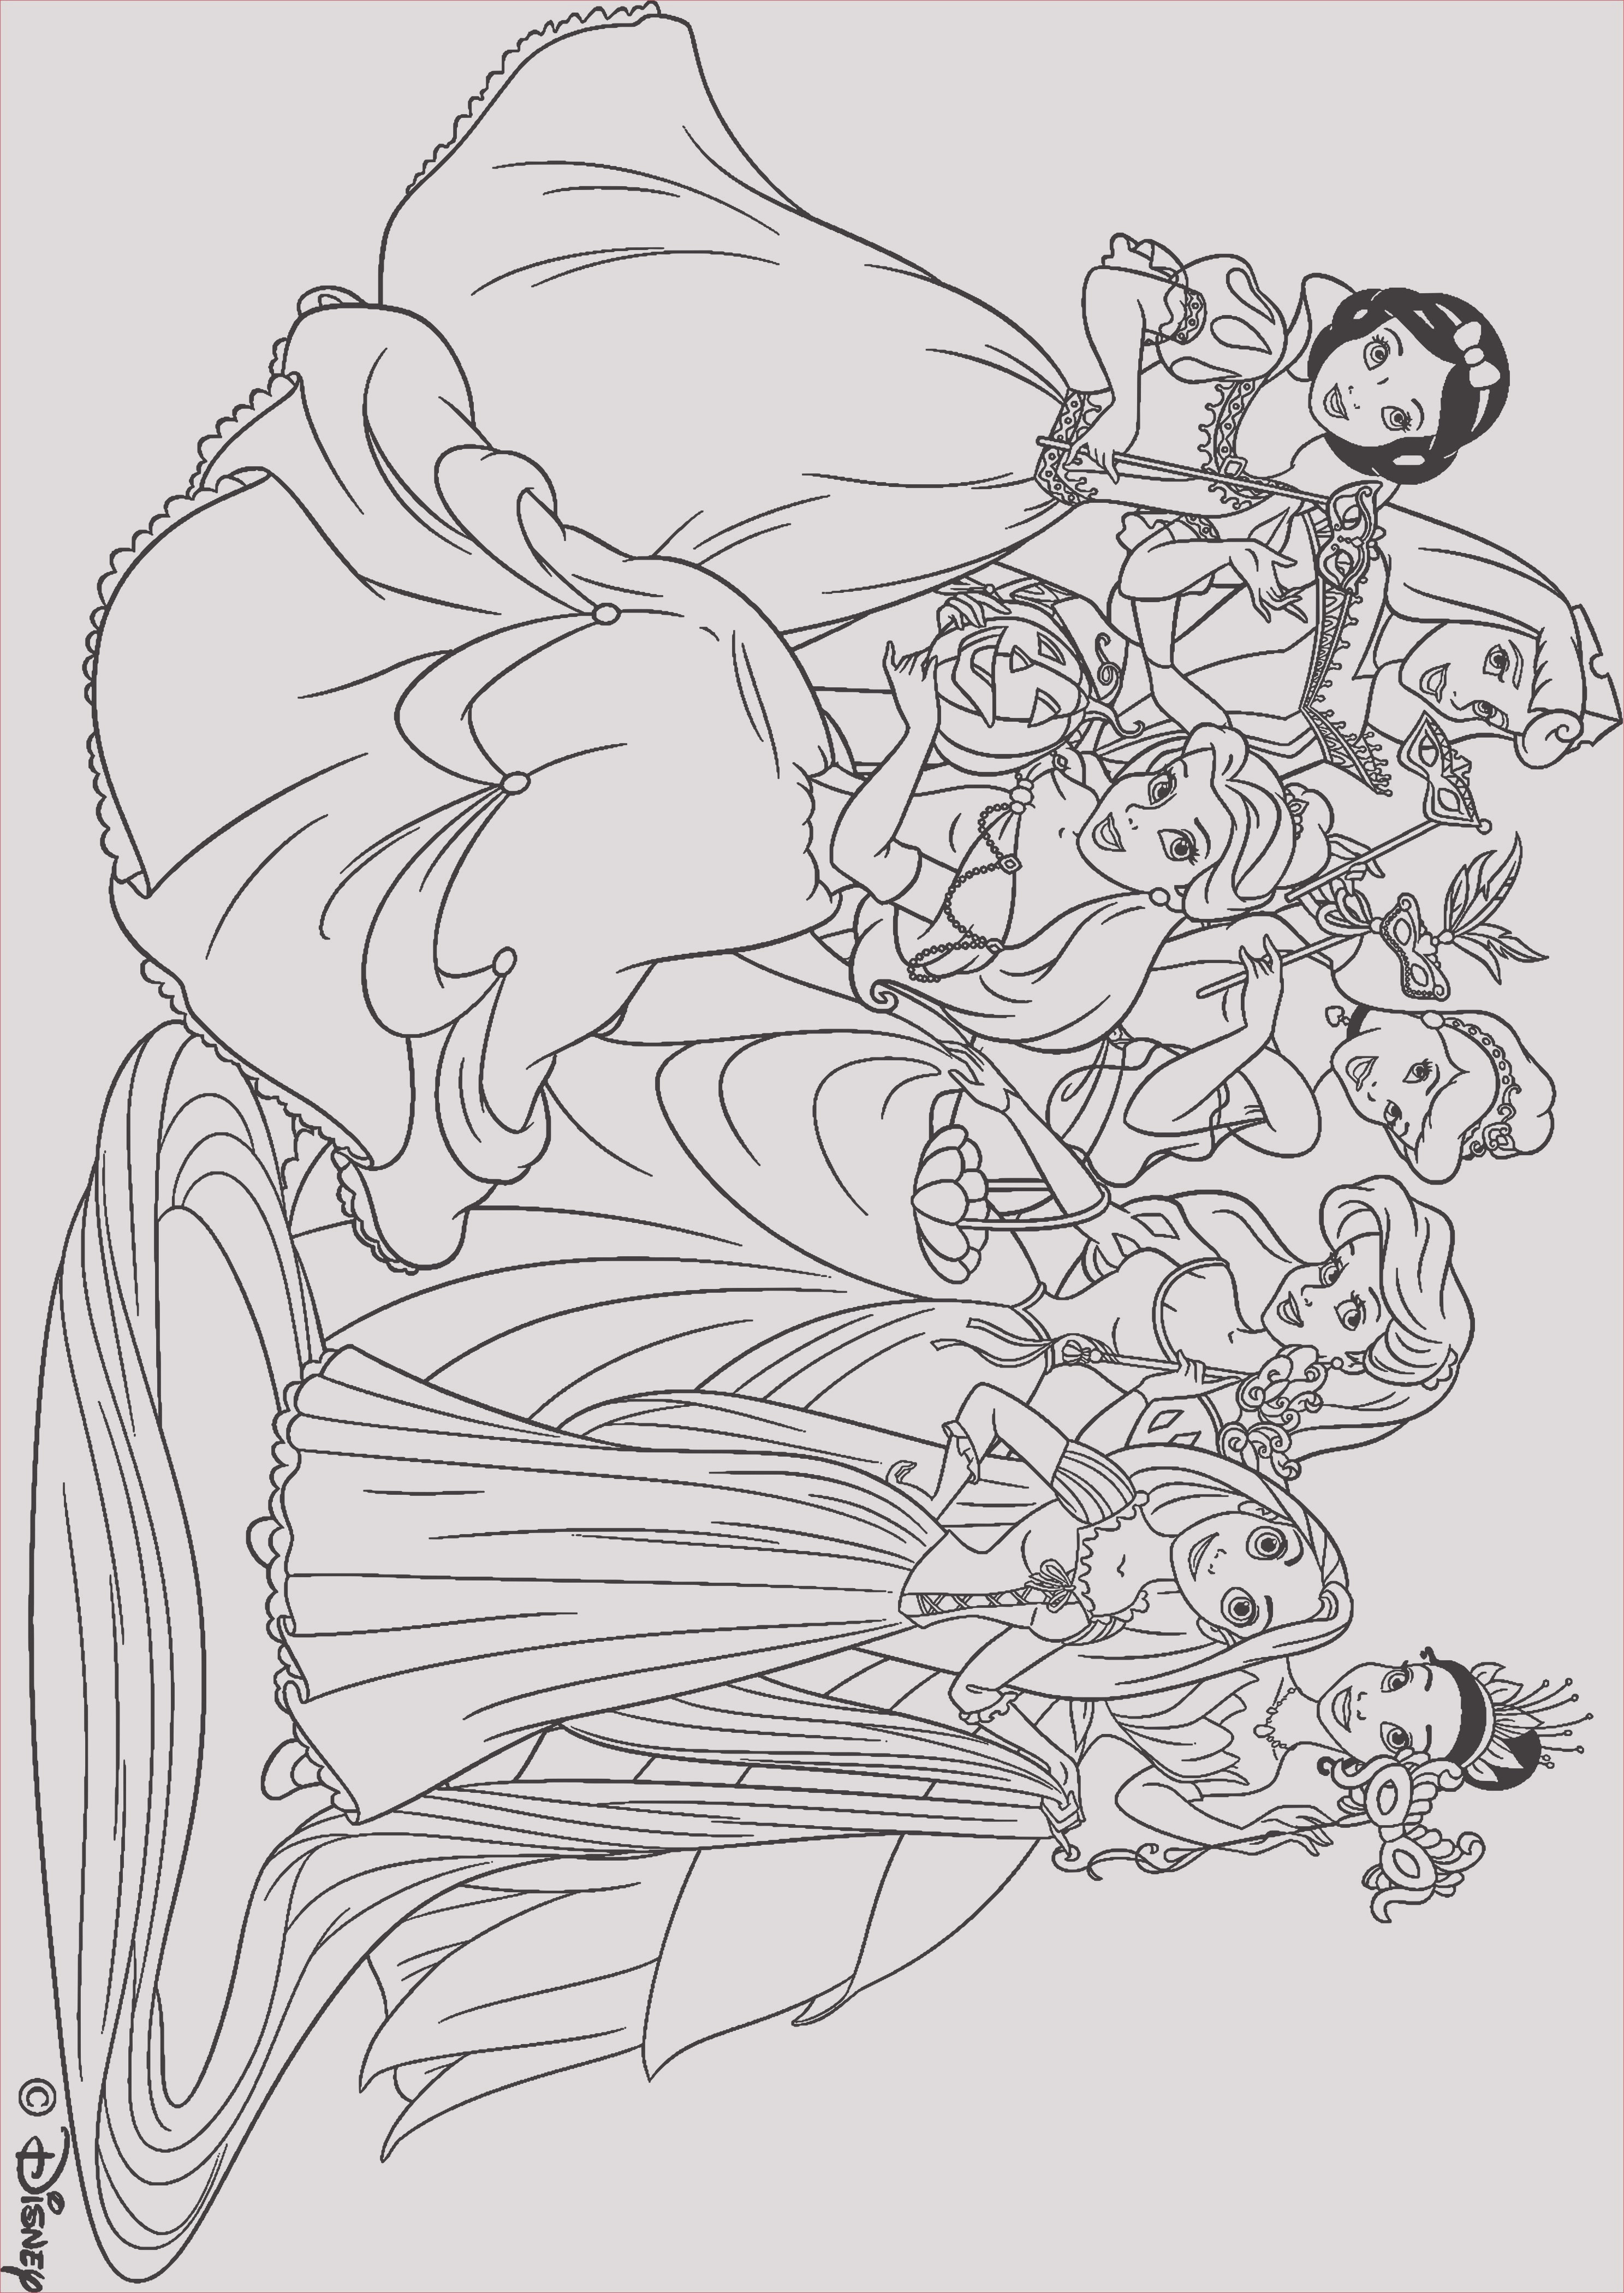 Ausmalbilder Disney Kostenlos Neu 30 Neu Disney Prinzessinnen Ausmalbilder Neuste Galerie